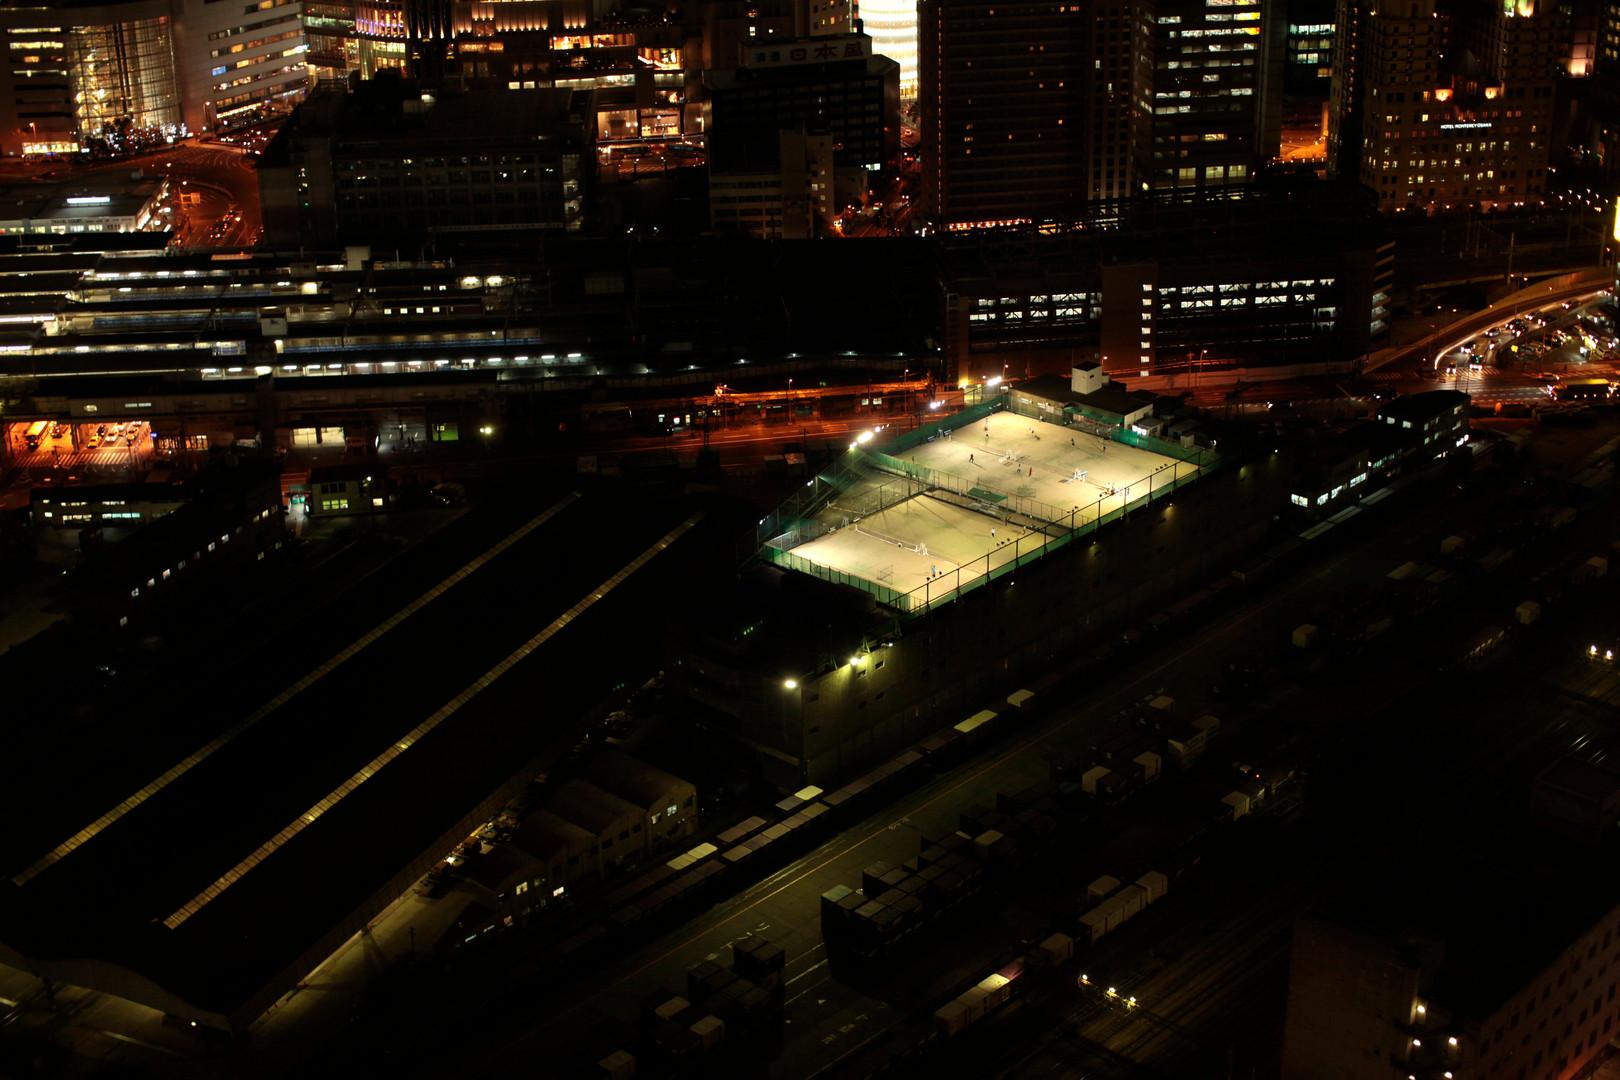 Japan_fosi vegue010.JPG